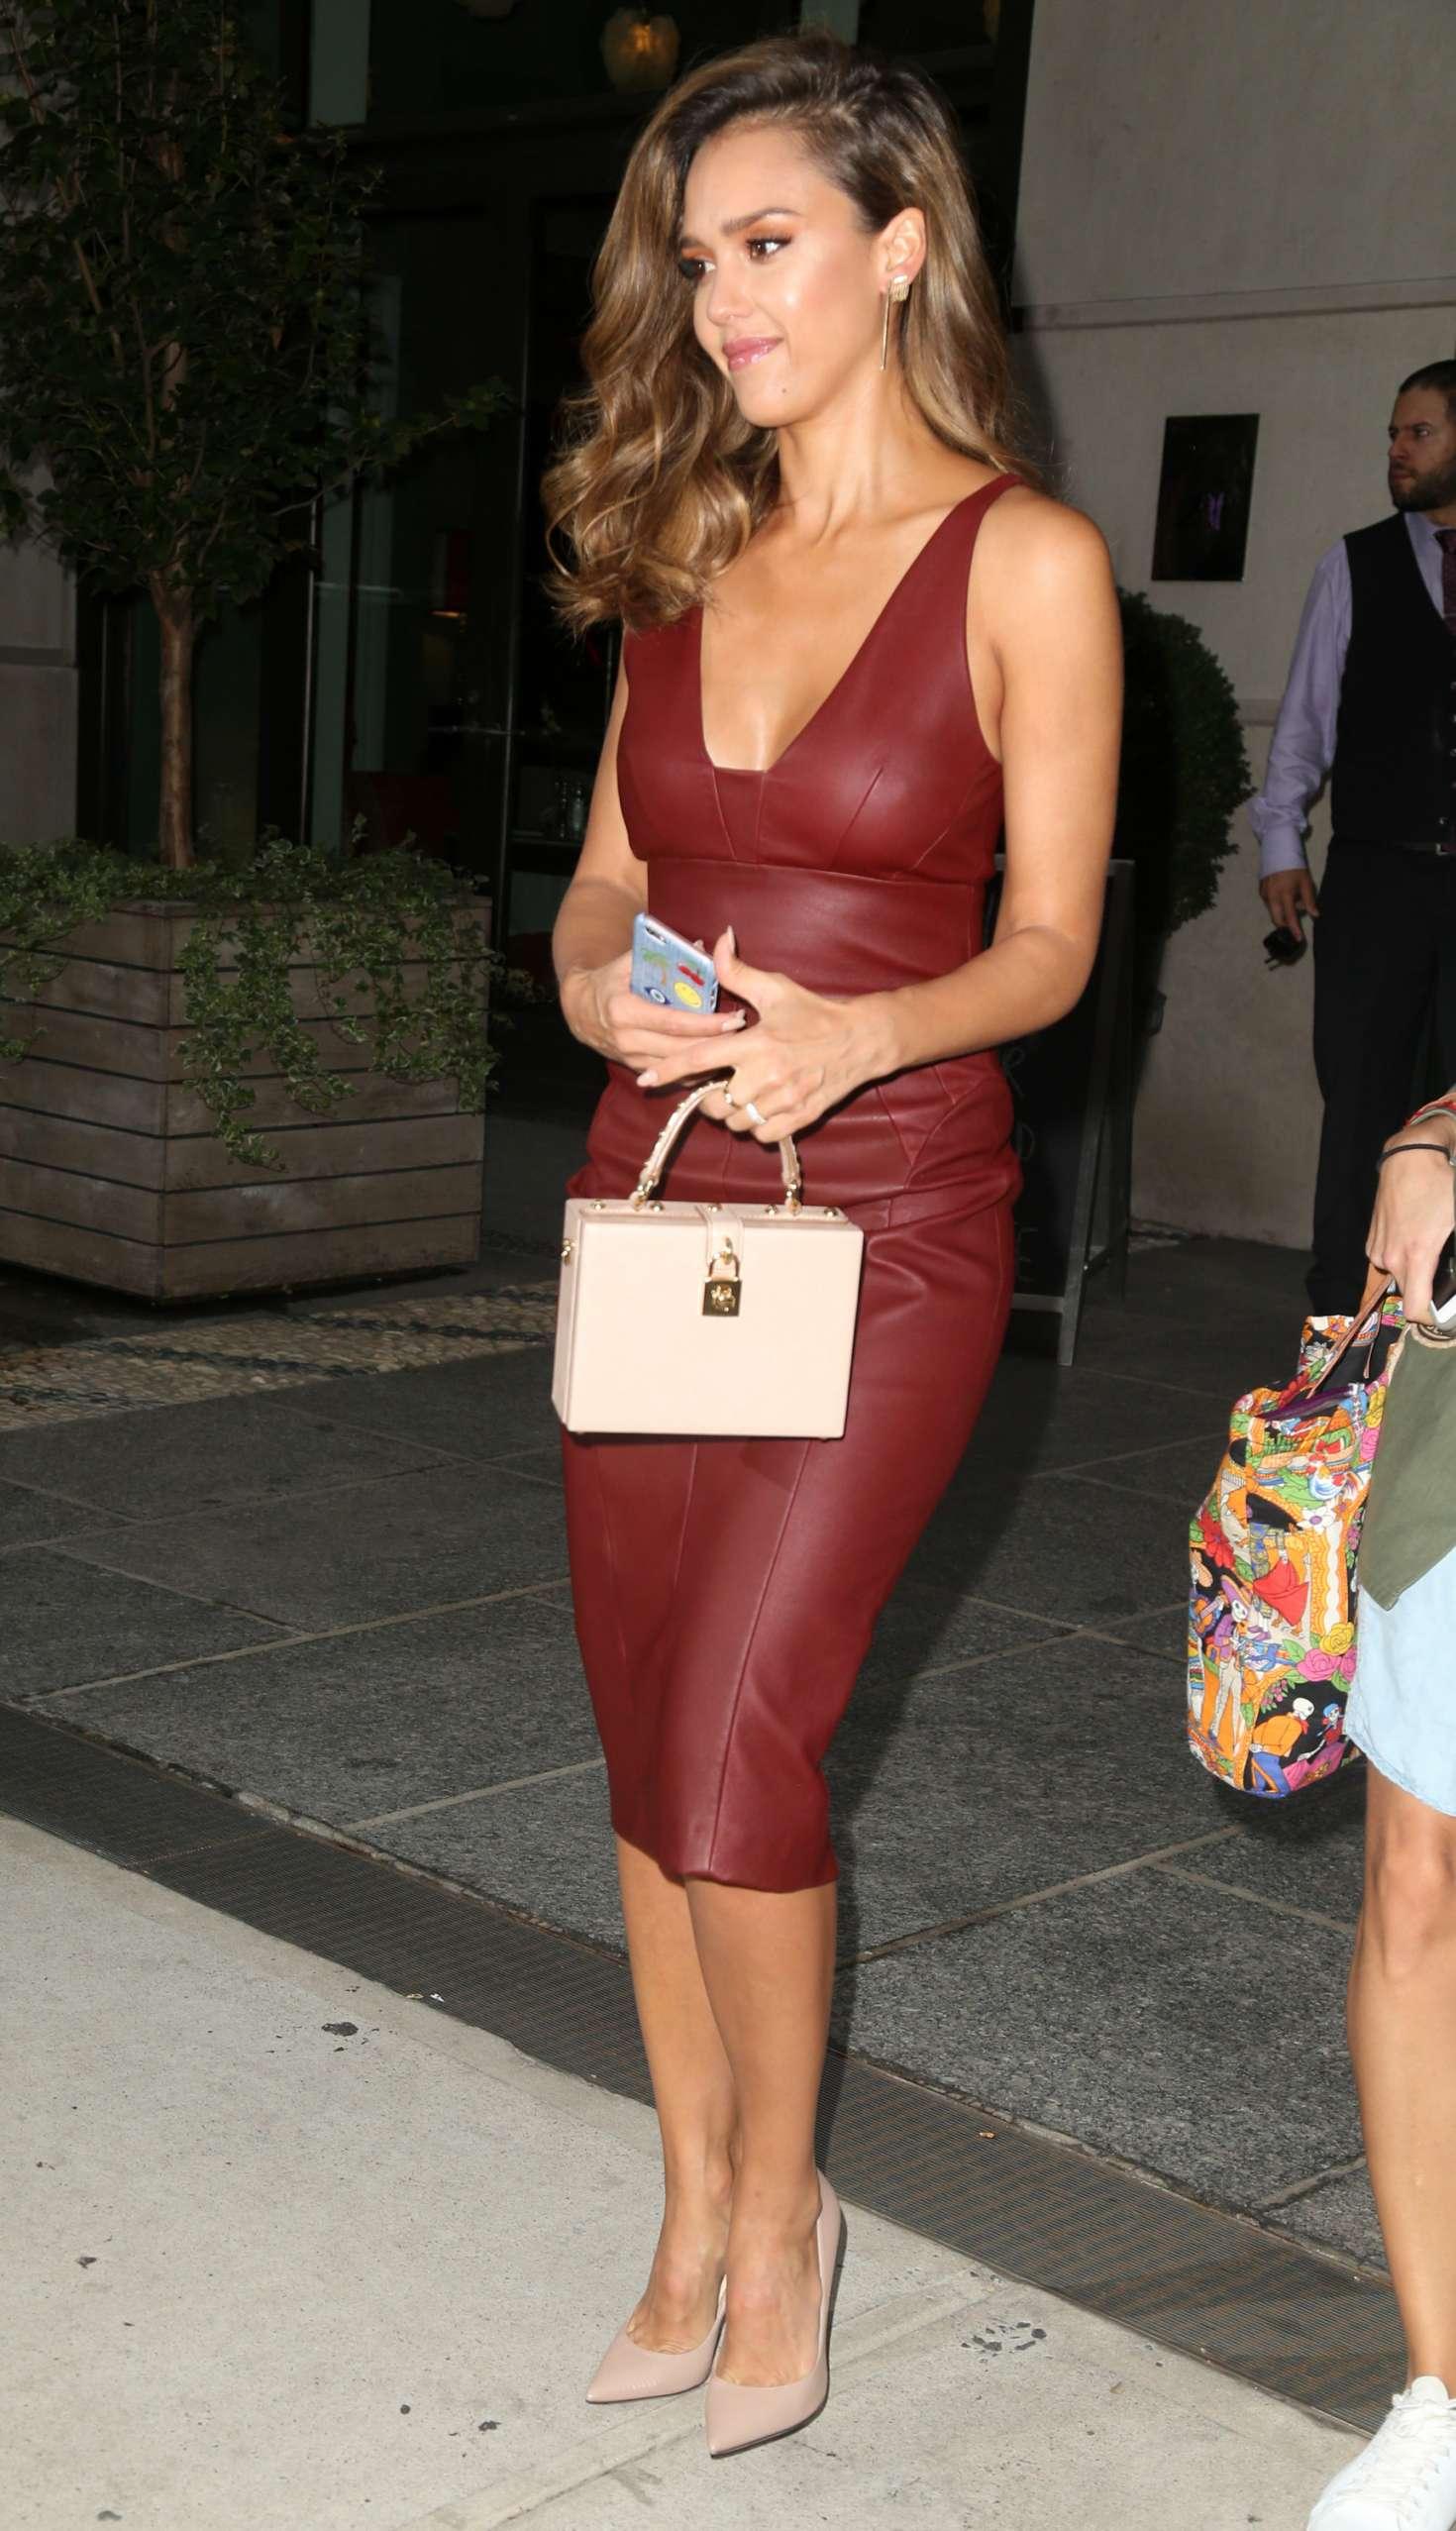 Jessica Alba in Red Leather Dress -08 | GotCeleb